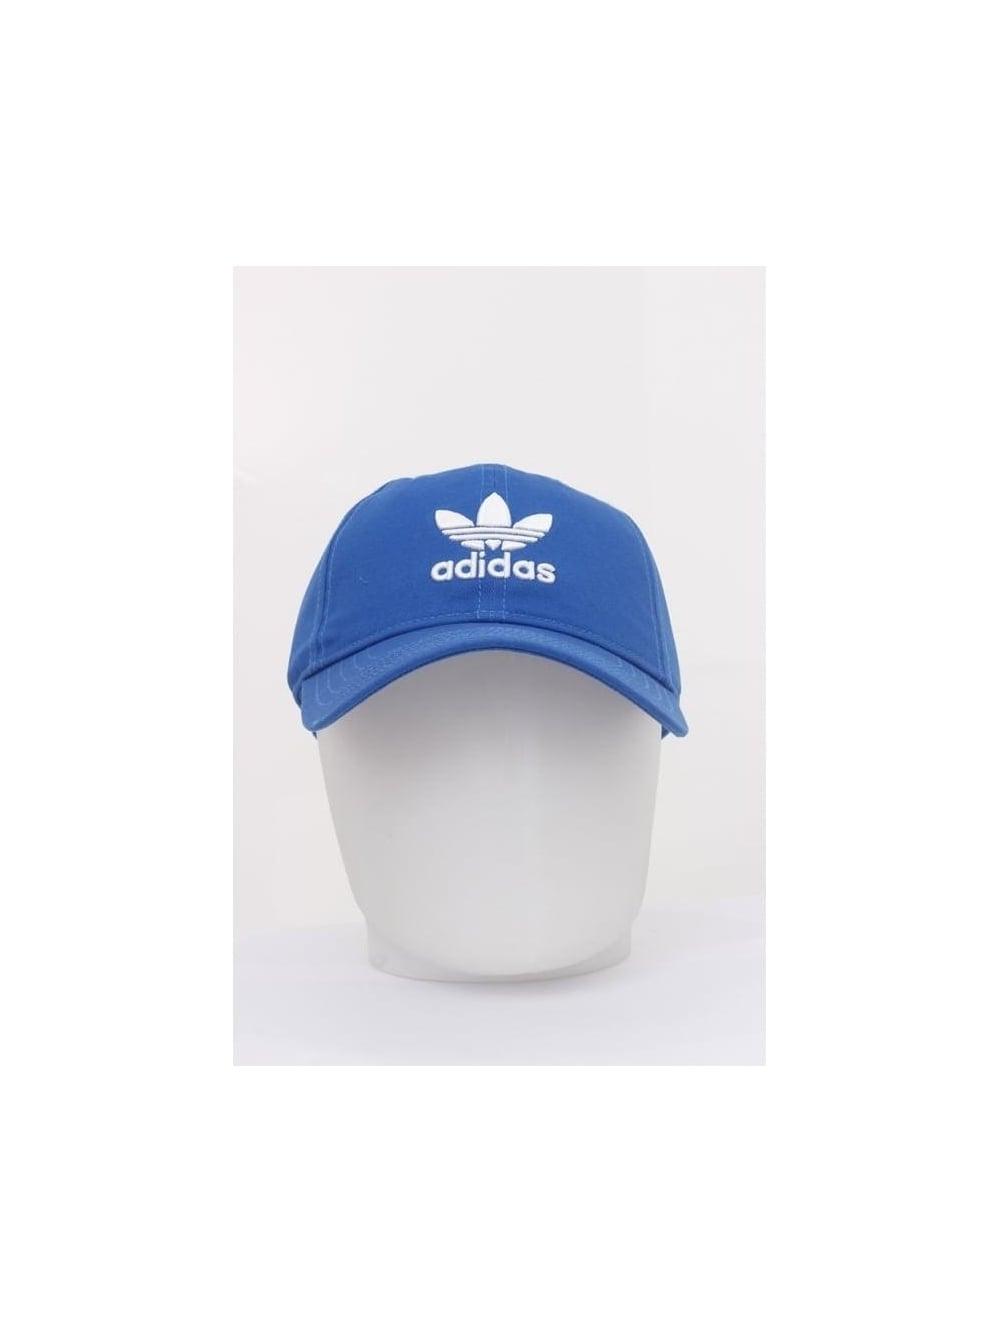 adidas Originals Trefoil Cap in Blue - Northern Threads f92822b5b5e6